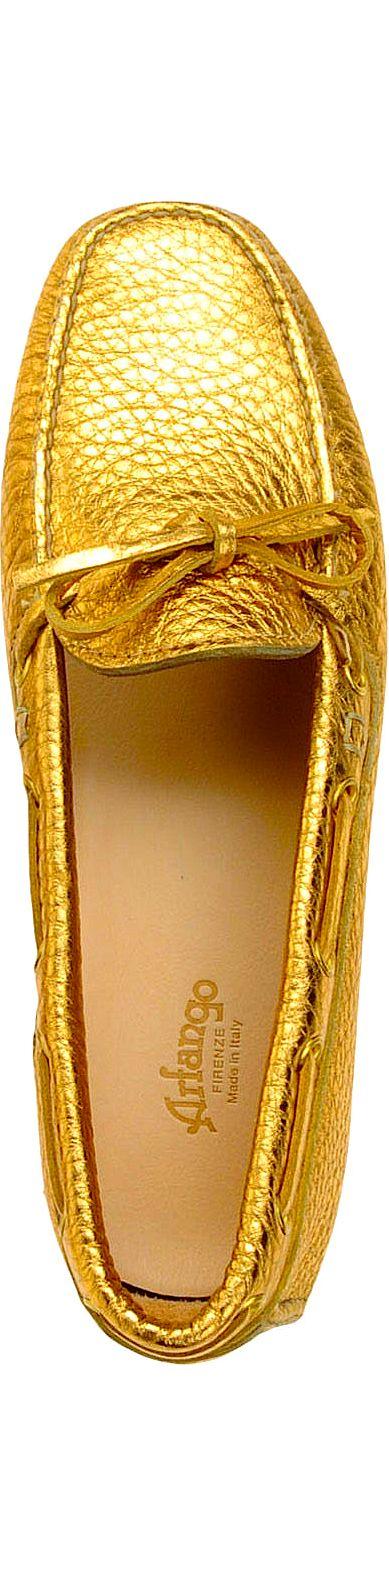 Color Dorado - Gold!!! Arfango